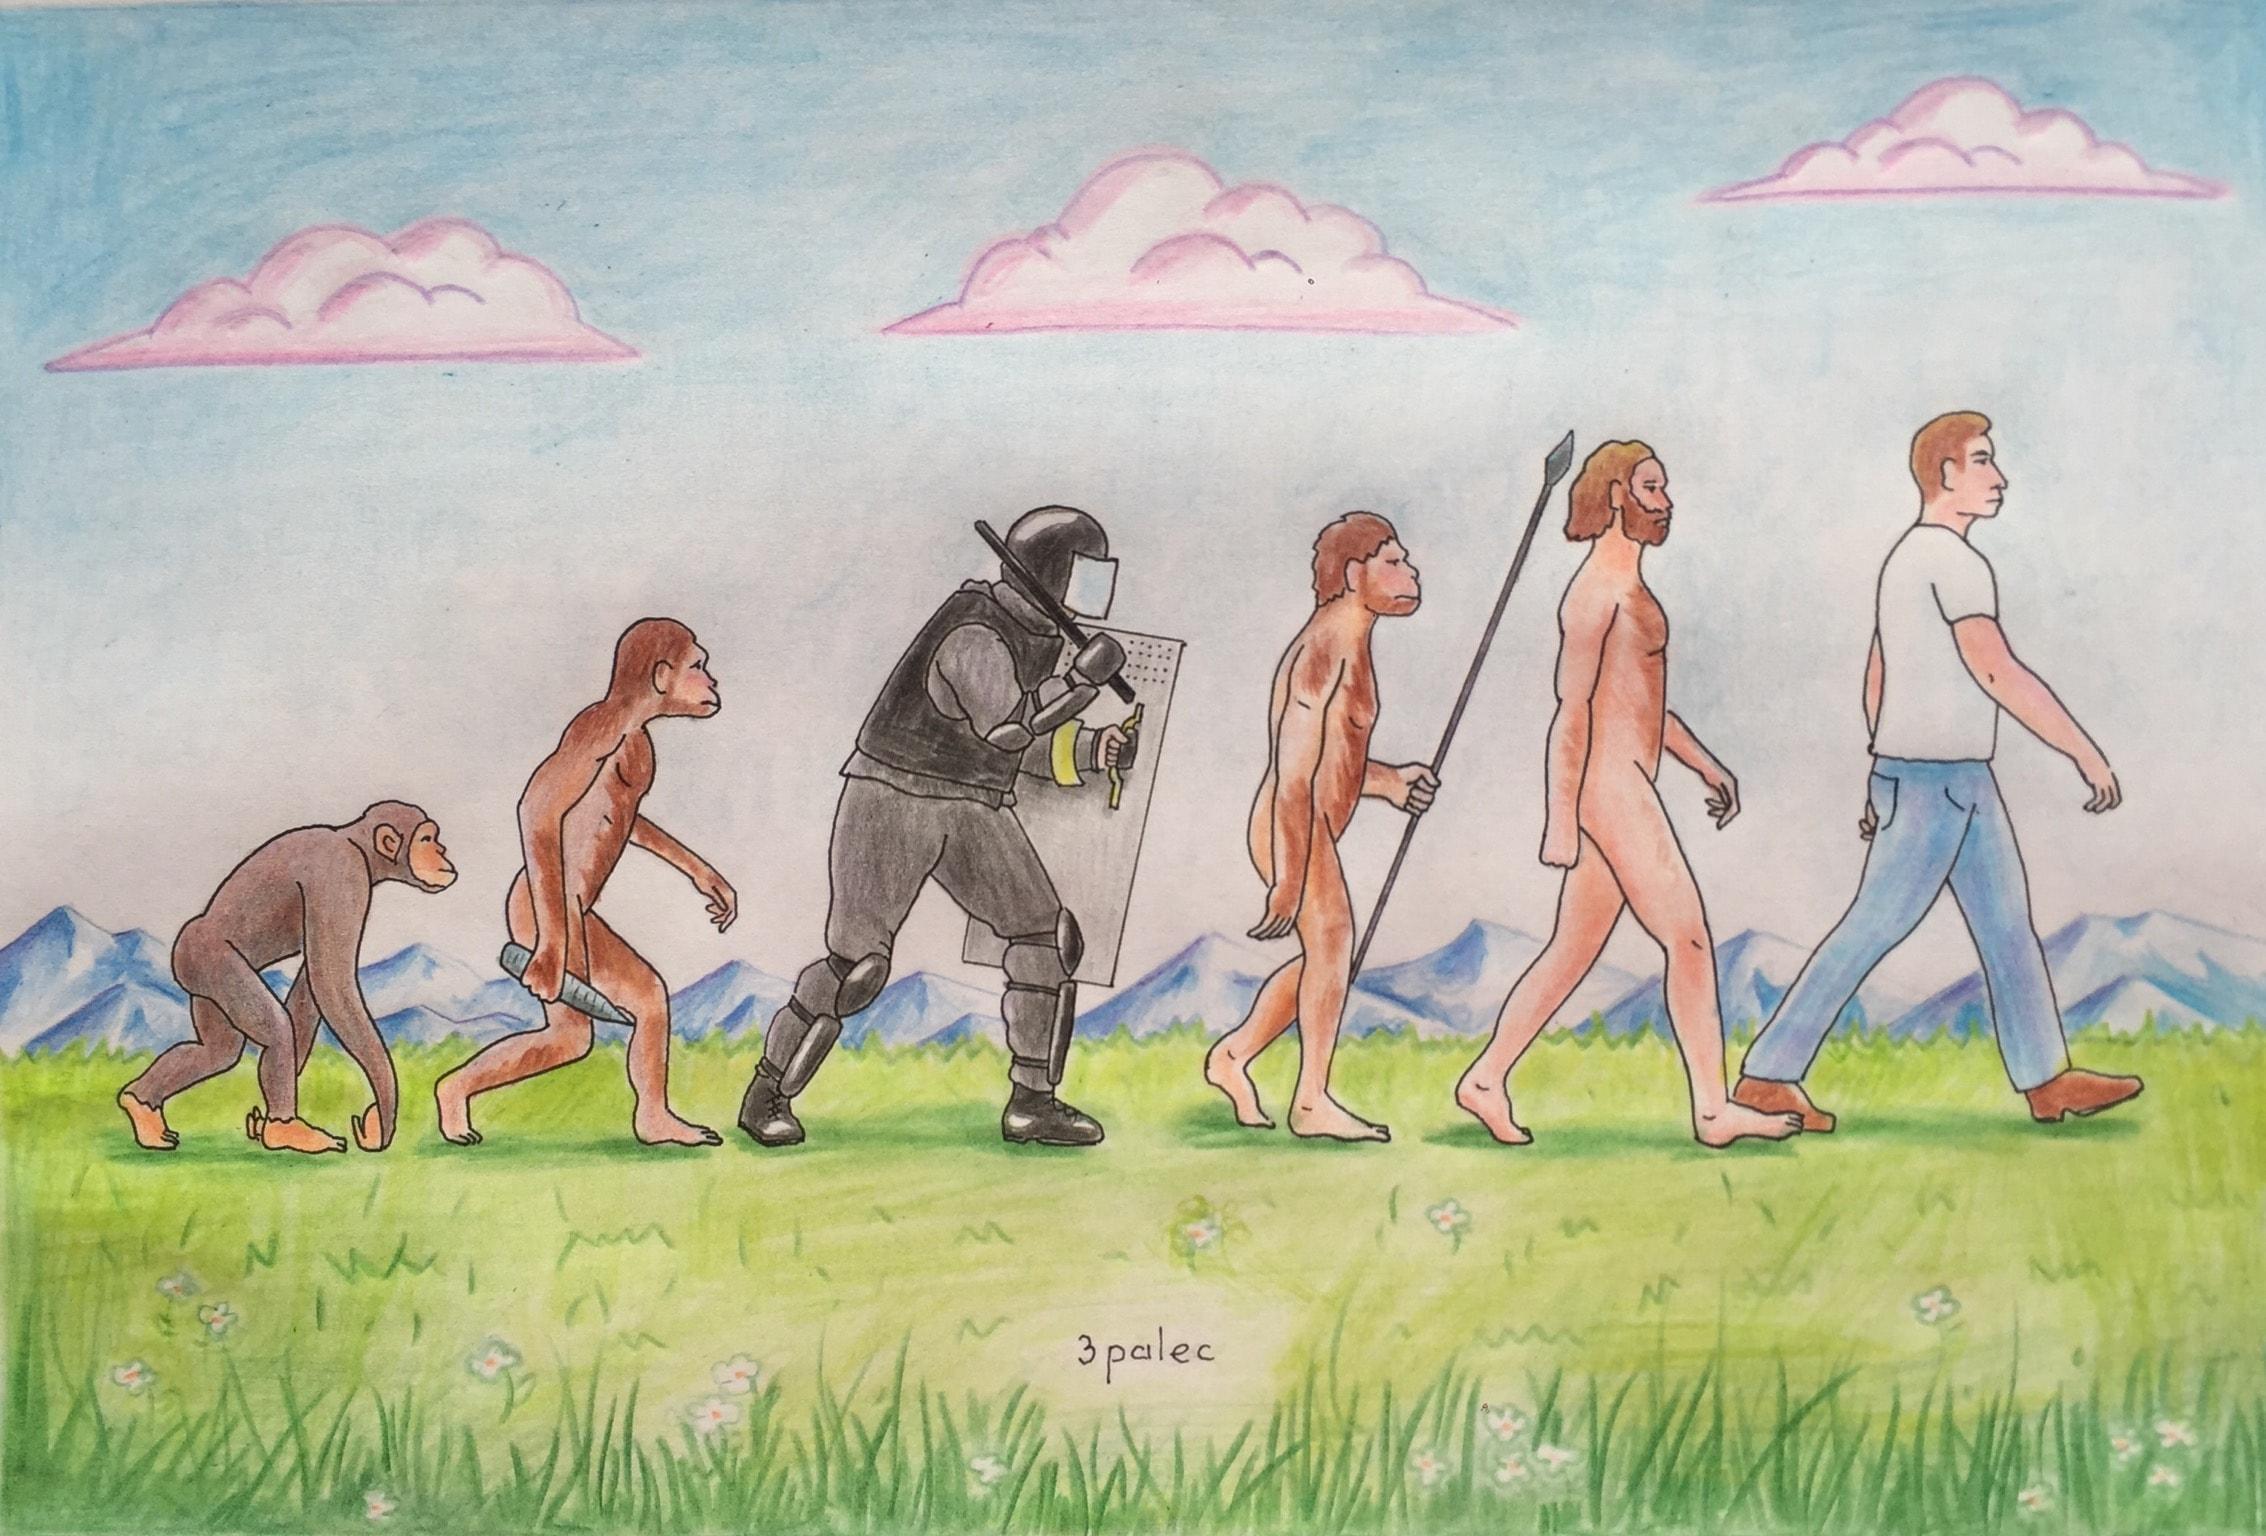 2266x1536, 508 Kb / эволюция, омон, карикатура